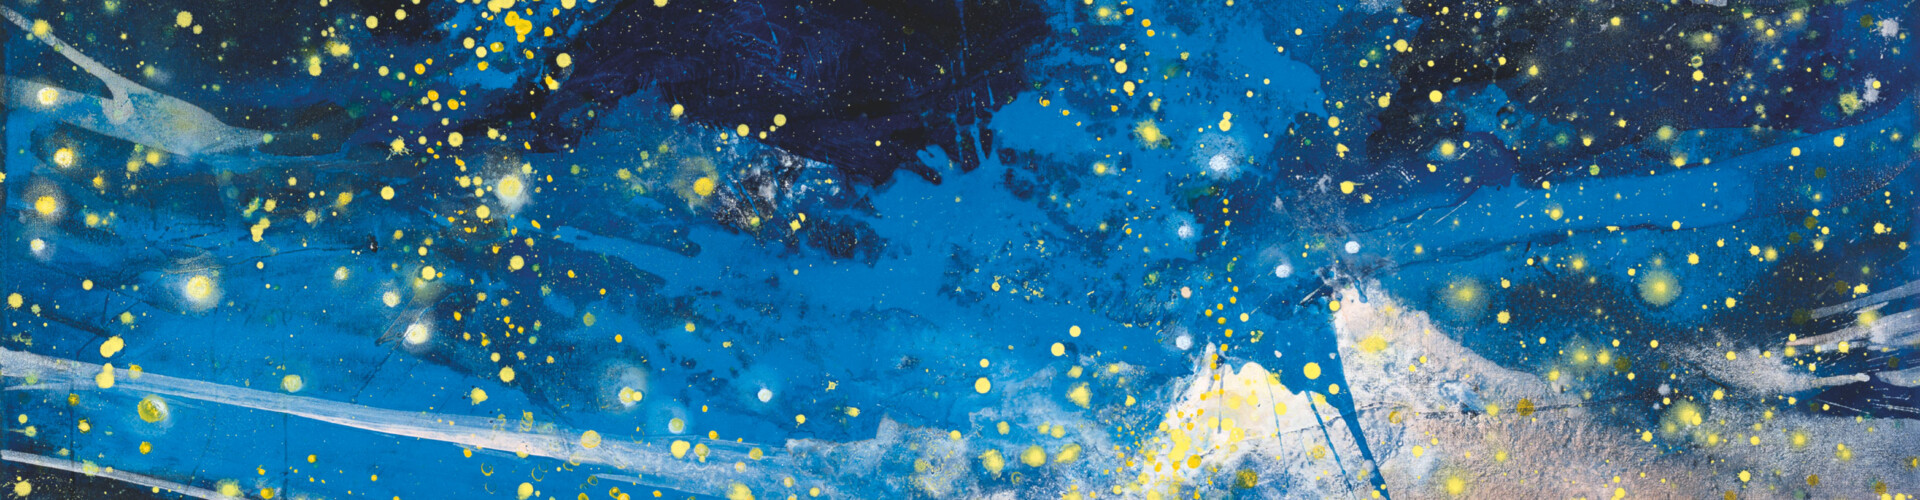 Bernd Zimmer, Expansion. Z-115, 2003, 120 x 145 cm, © Bernd Zimmer, VG Bild-Kunst, Bonn 2020, Photo: Hans Döring, Munich